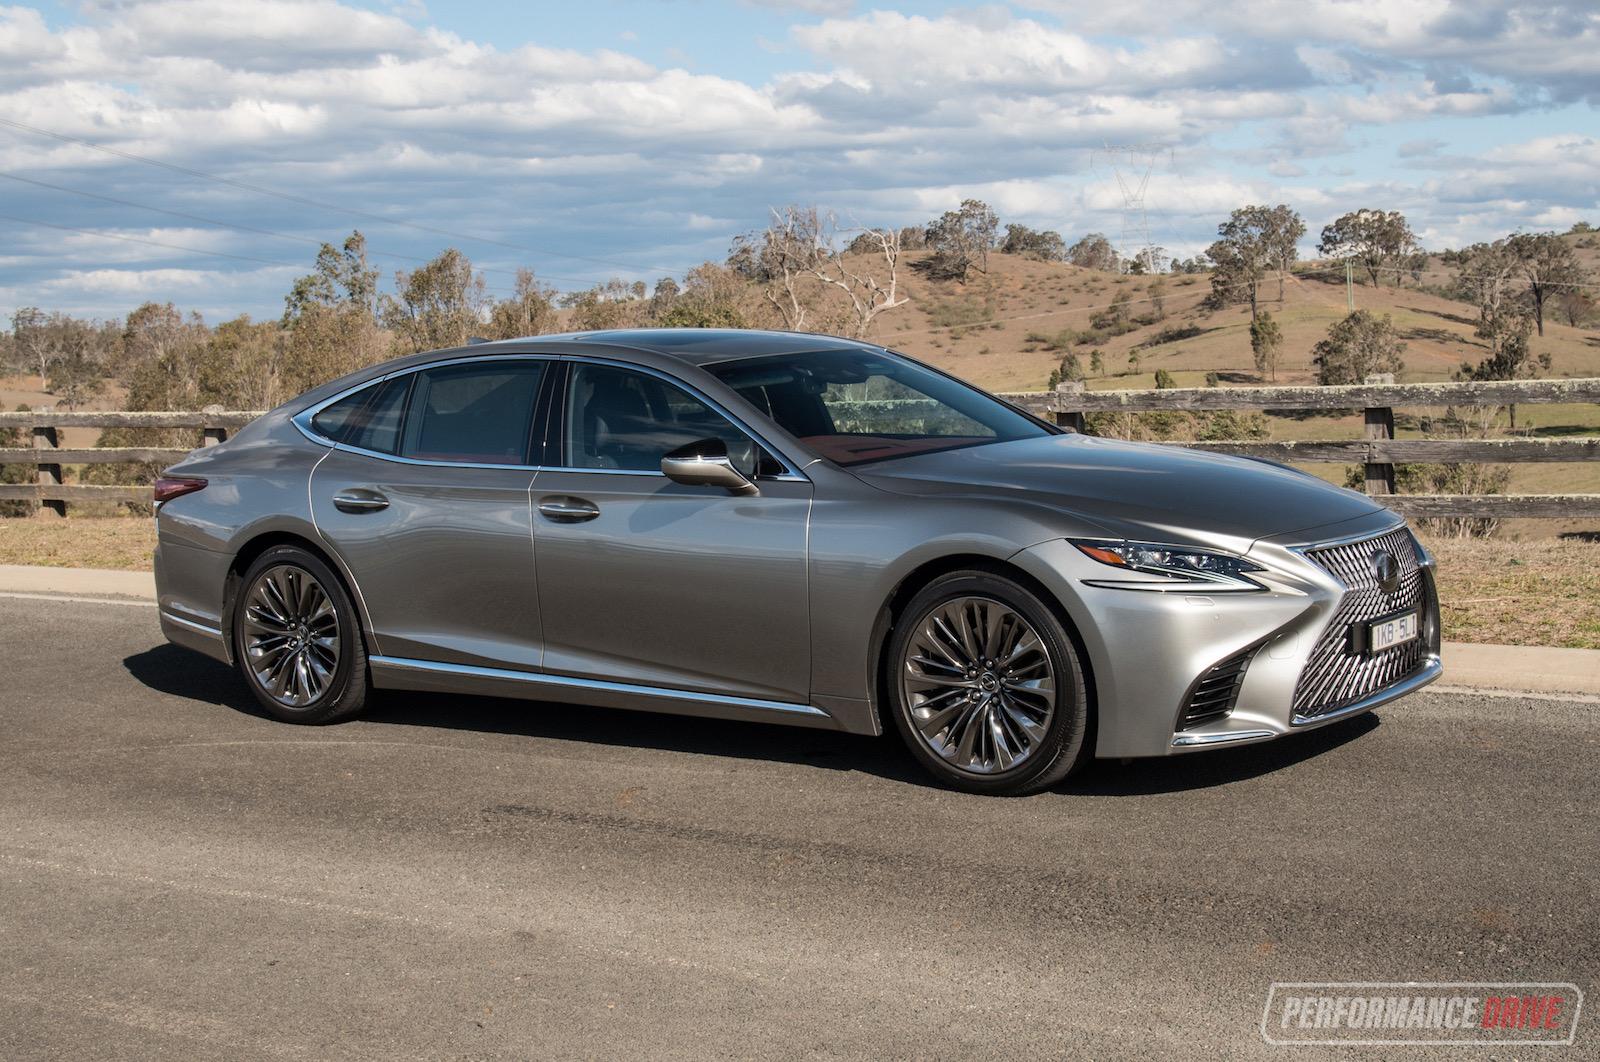 2018 Lexus LS 500 twin-turbo review (video)